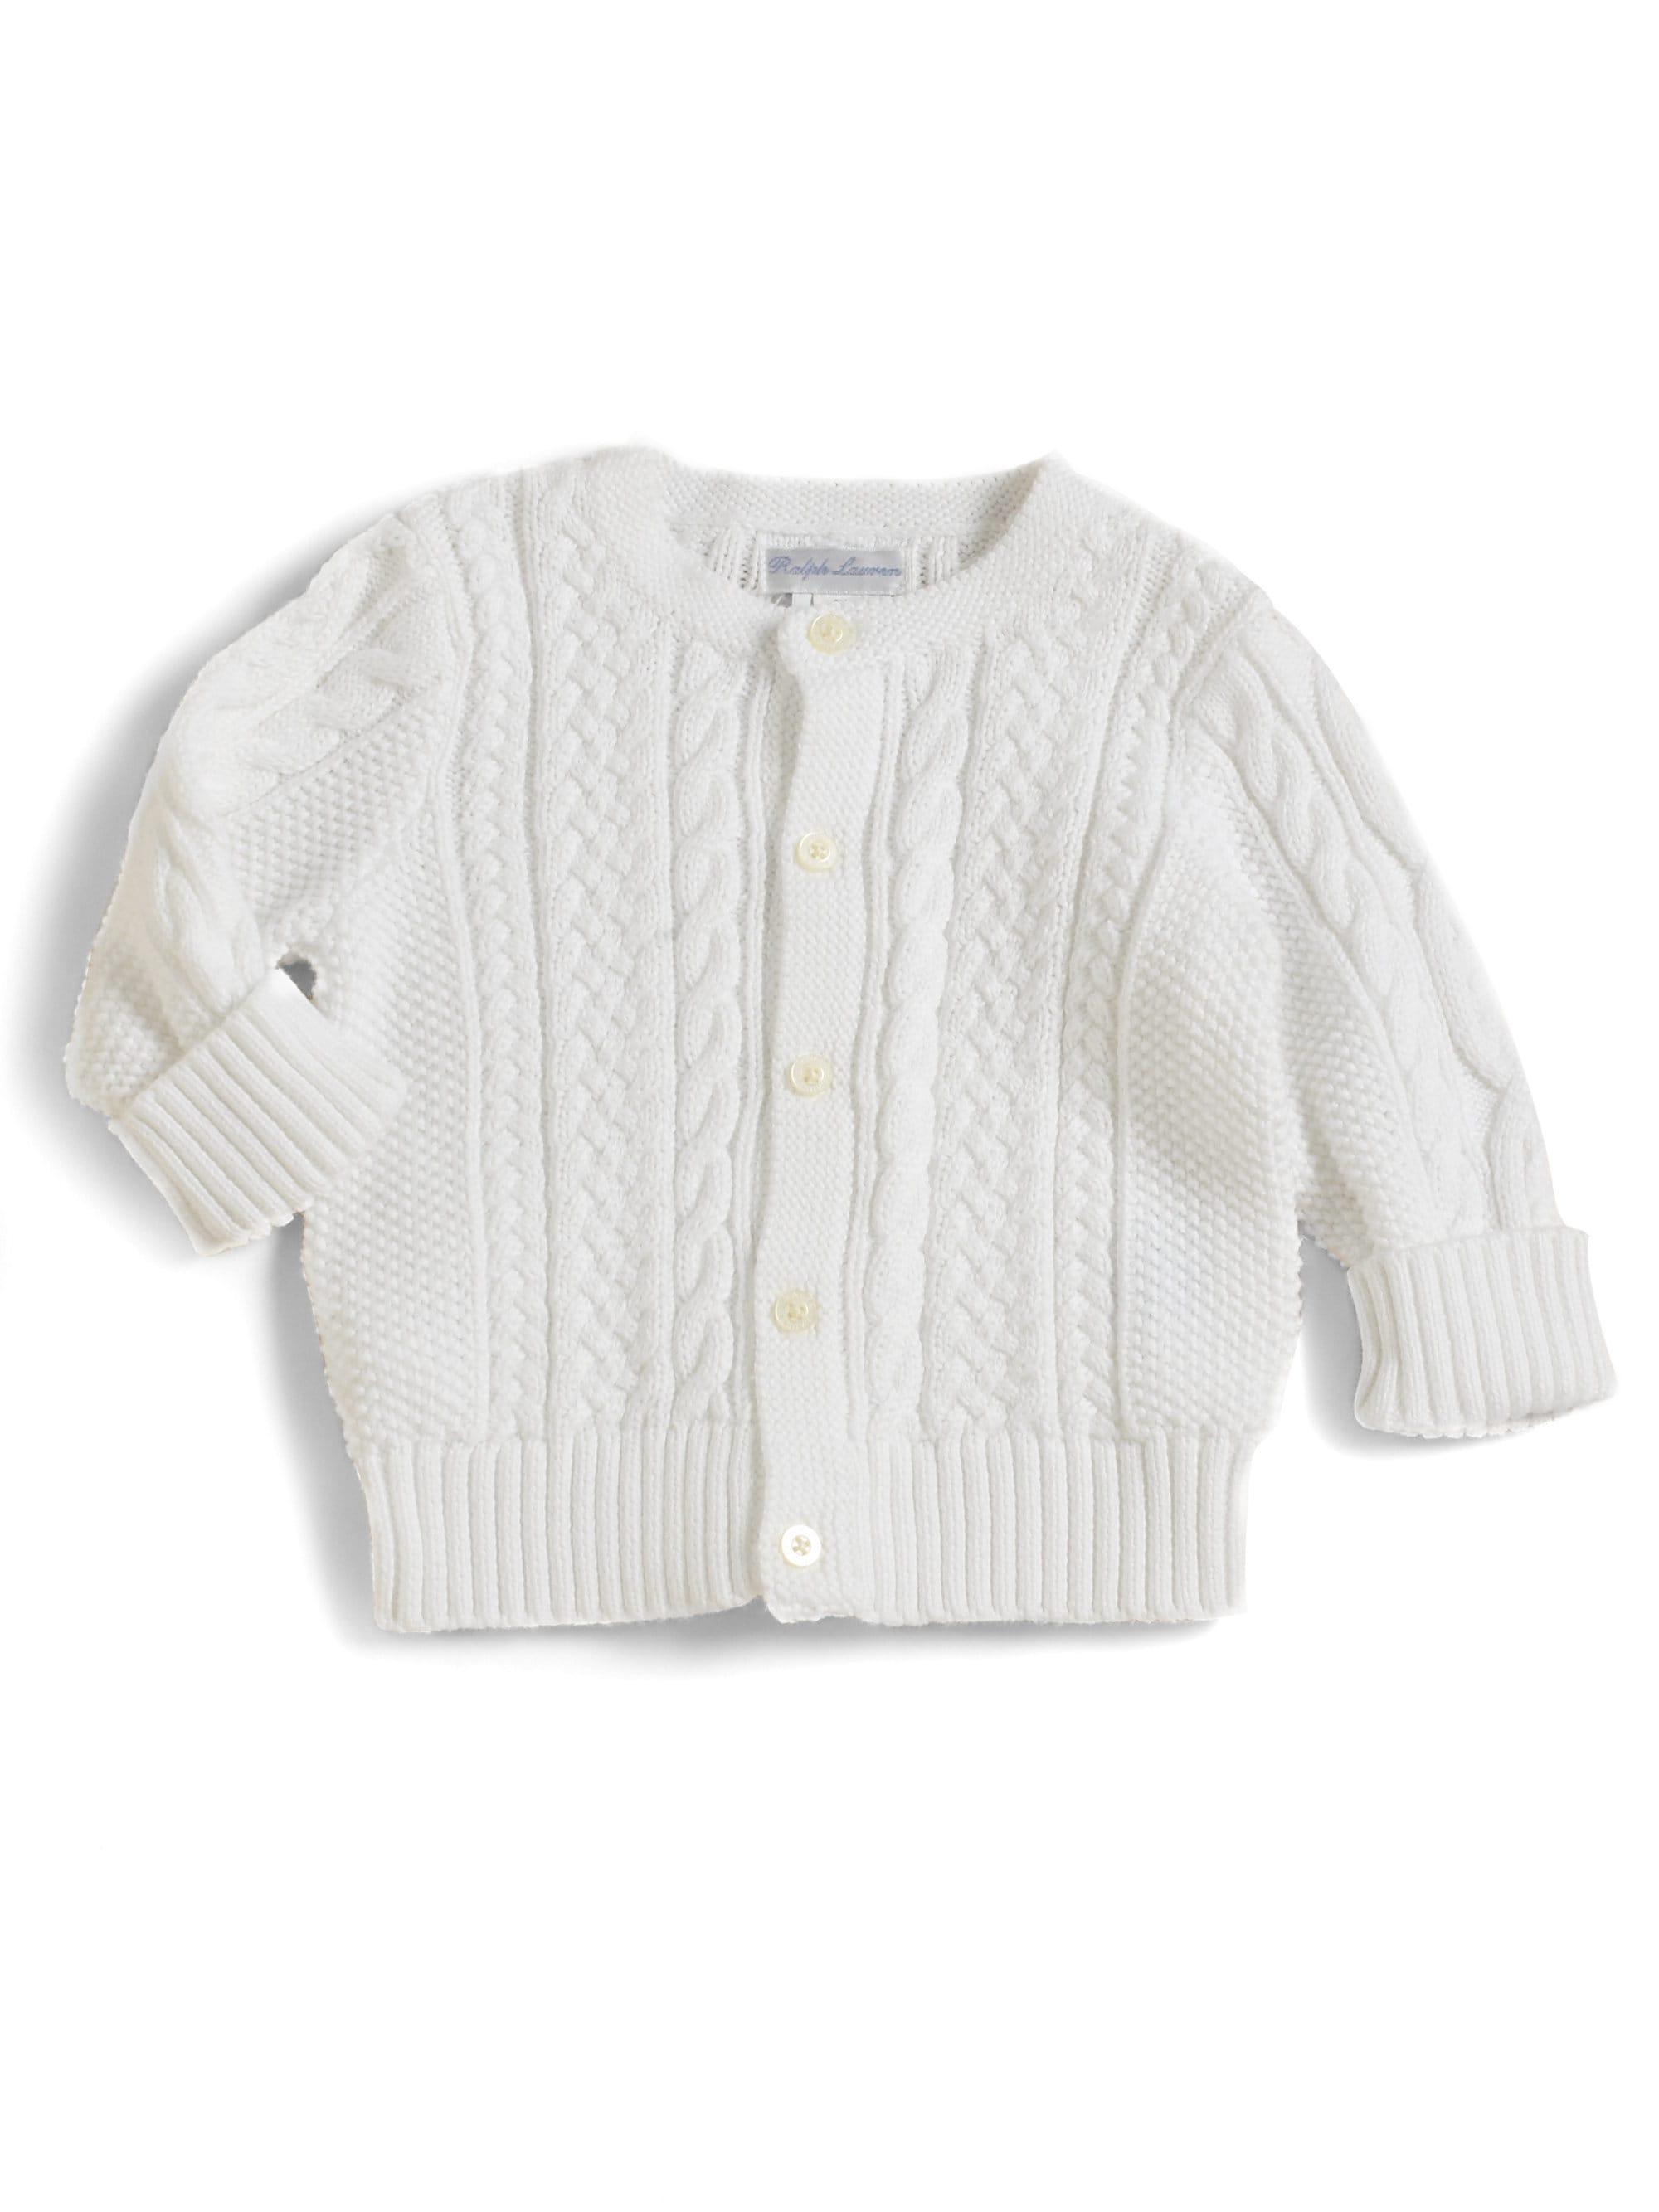 837cda3fb008 Lyst - Ralph Lauren Baby Girl s Mercerized Cotton Cardigan in White